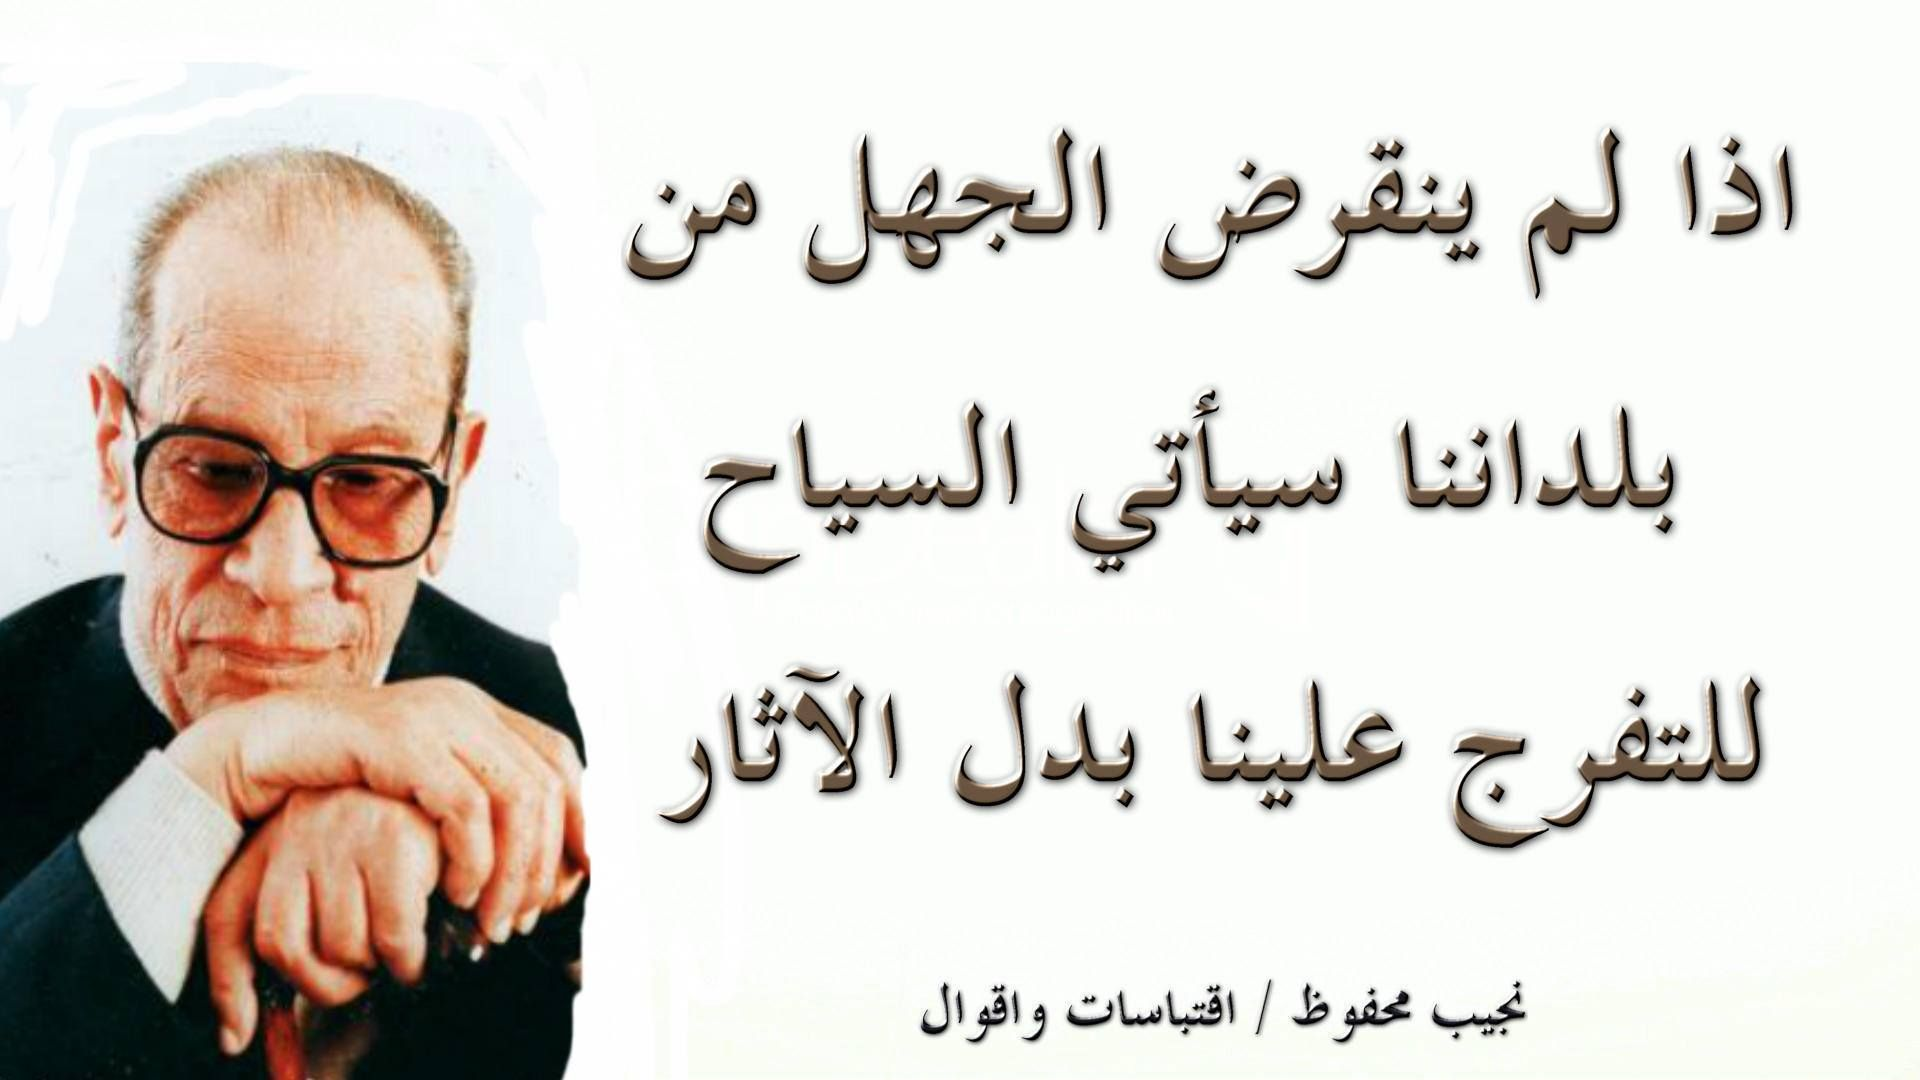 نجيب محفوظ Quotations Arabic Quotes Quotes